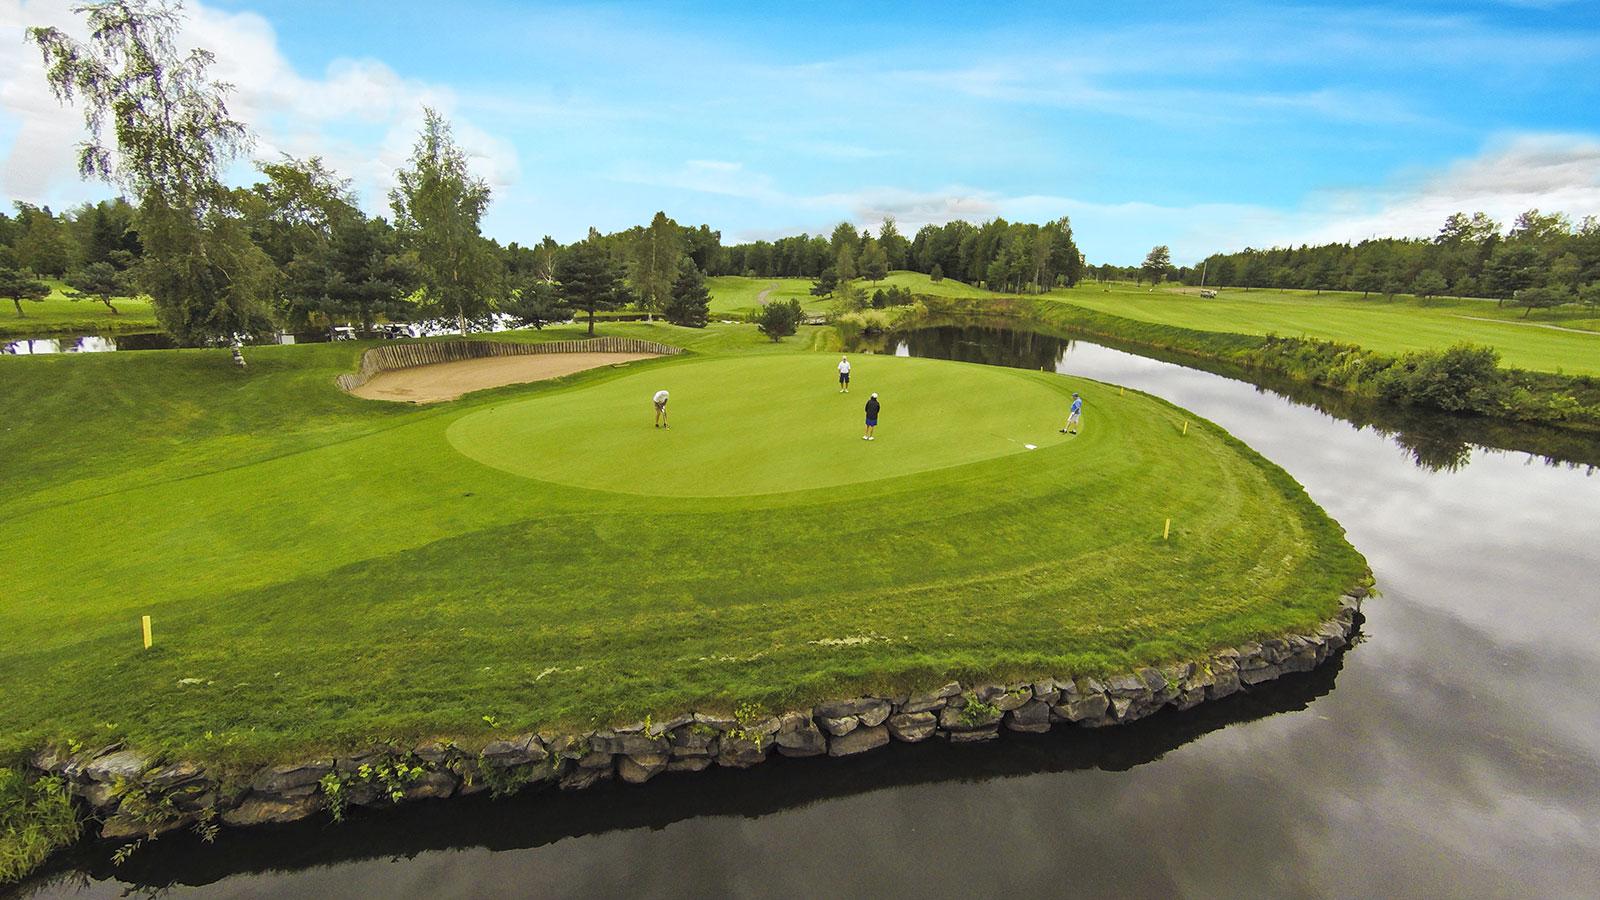 Club de golf Bois-Francs